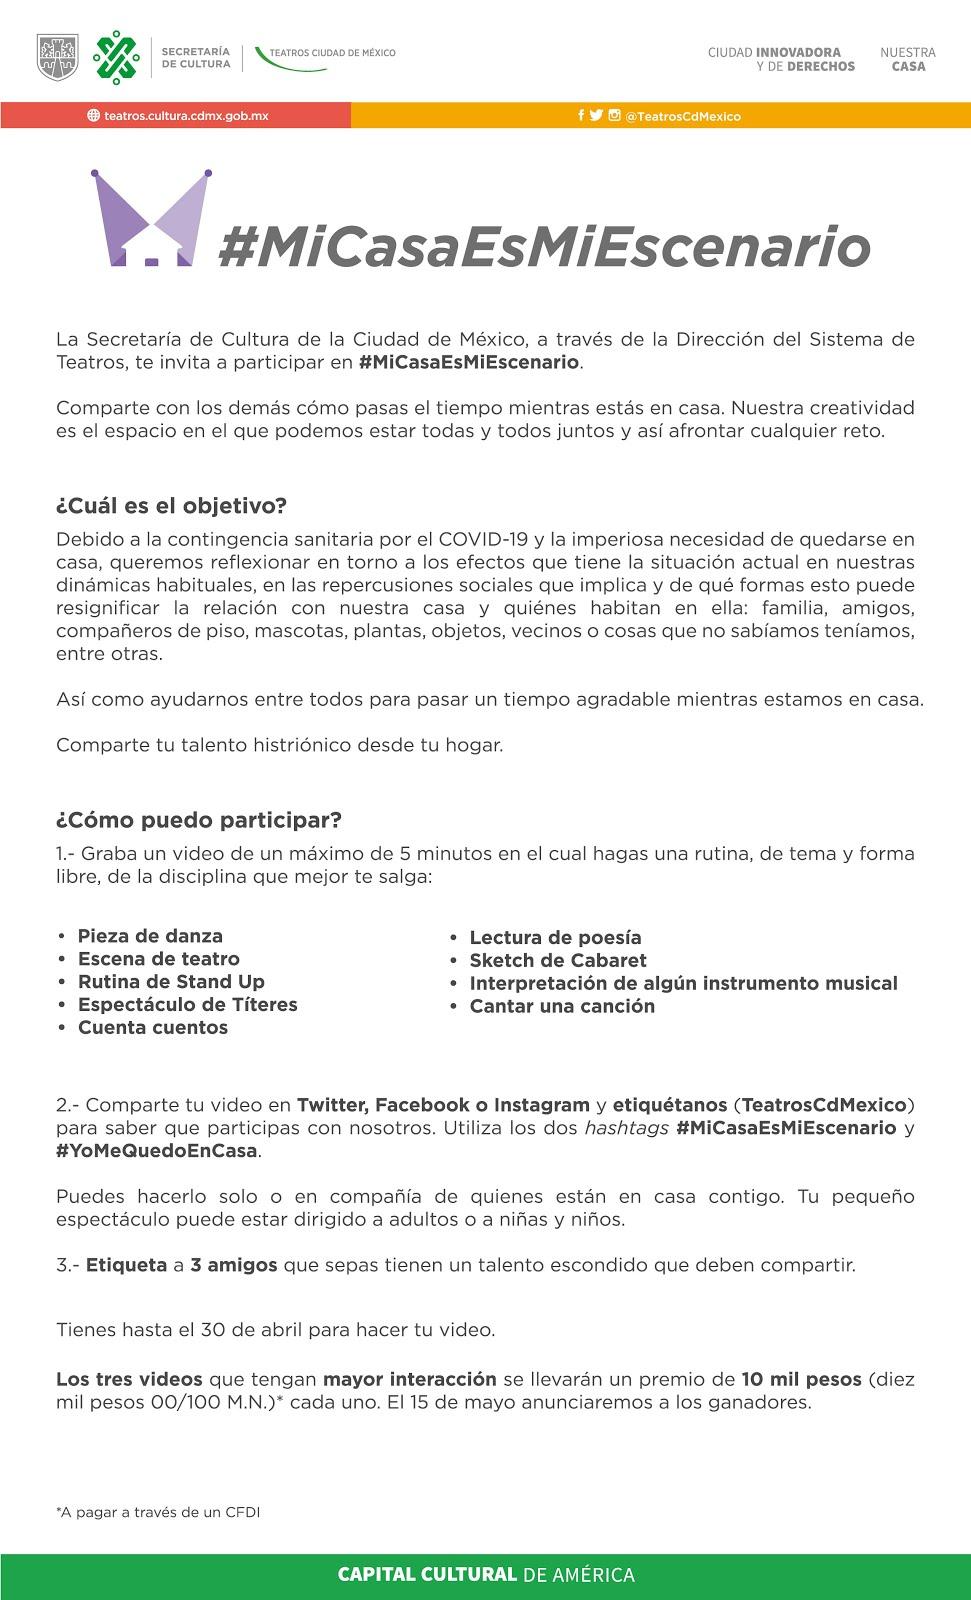 #MiCasaEsMiEscenario